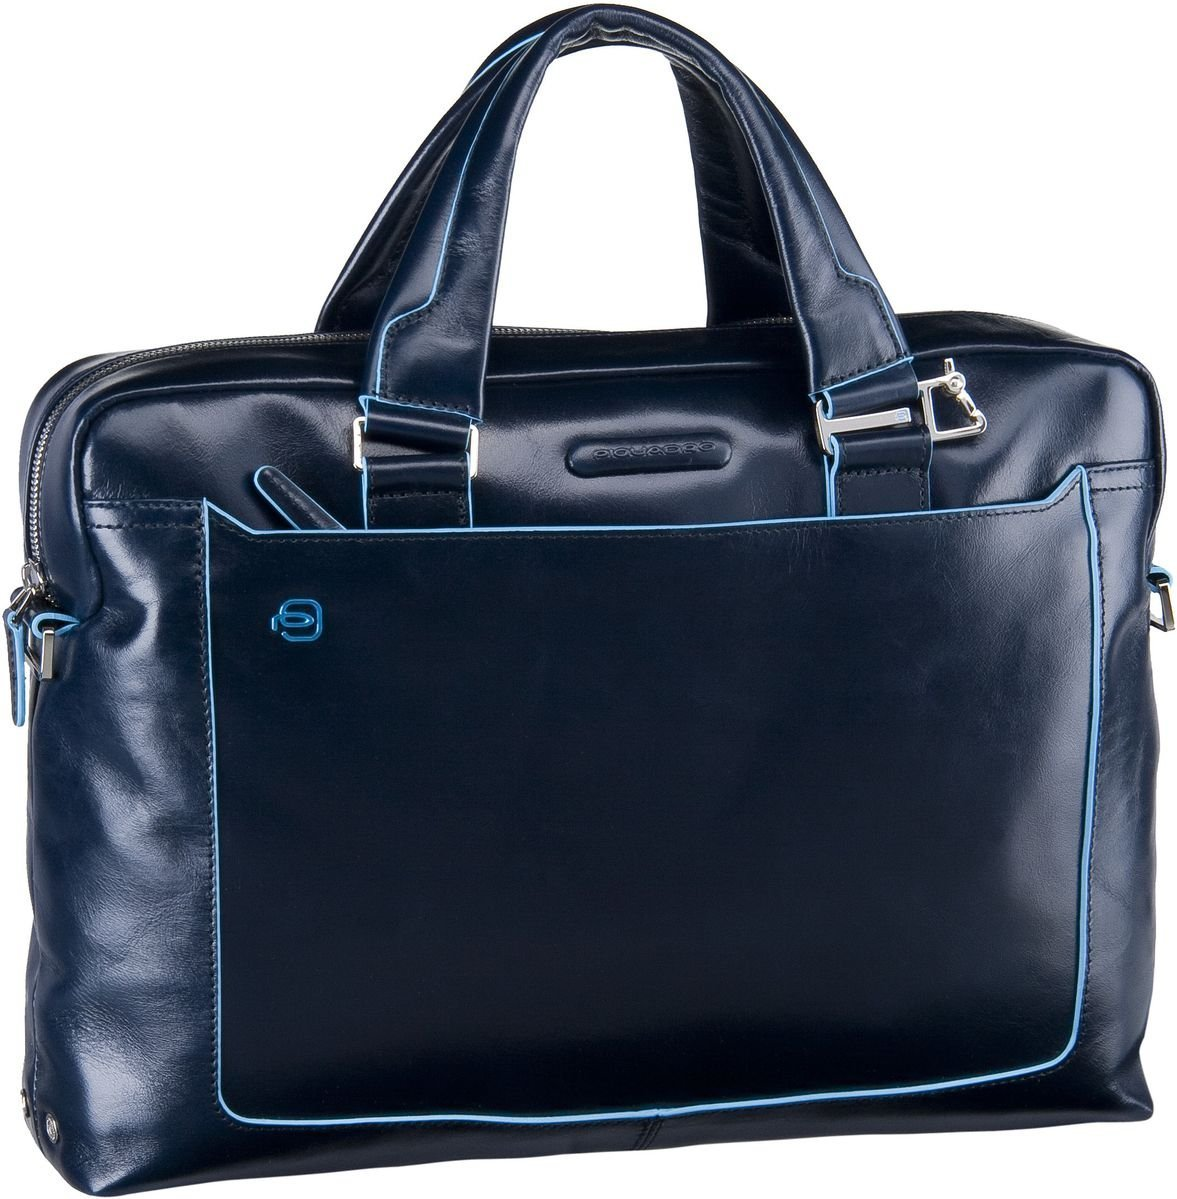 piquadro -  Aktentasche Blue Square Tote Bag Quer Blu Notte